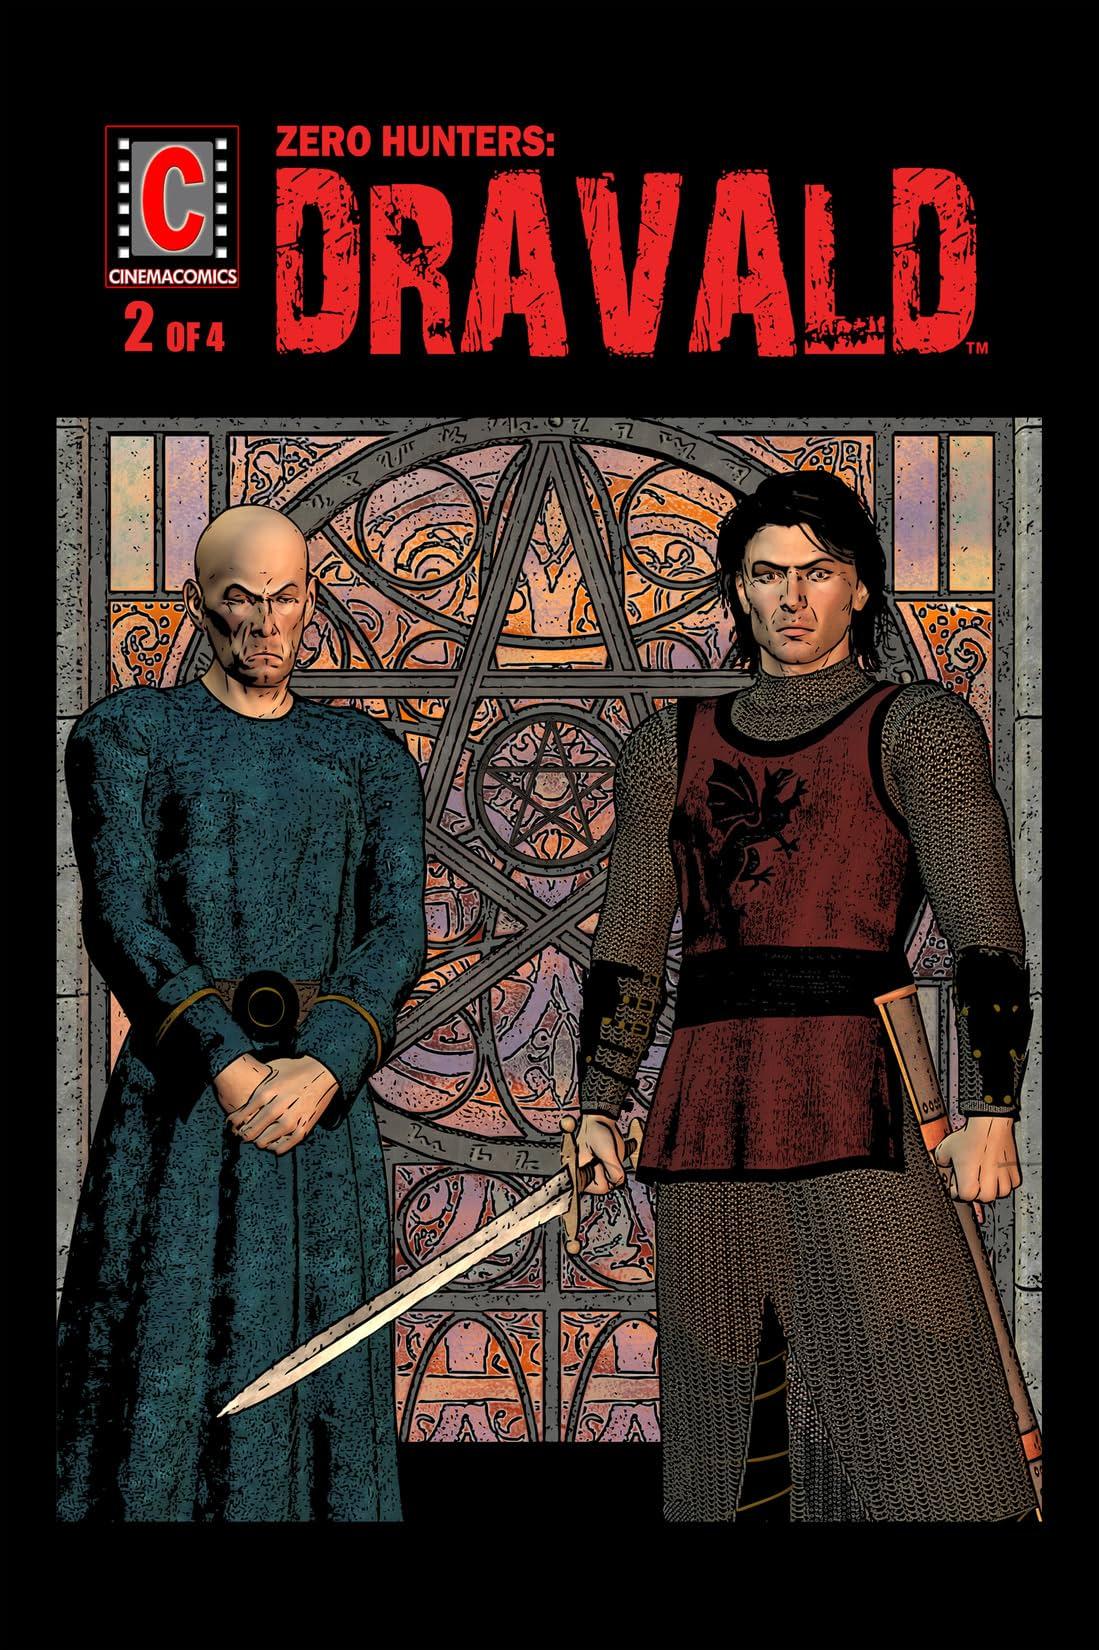 Zero Hunters: Dravald #2